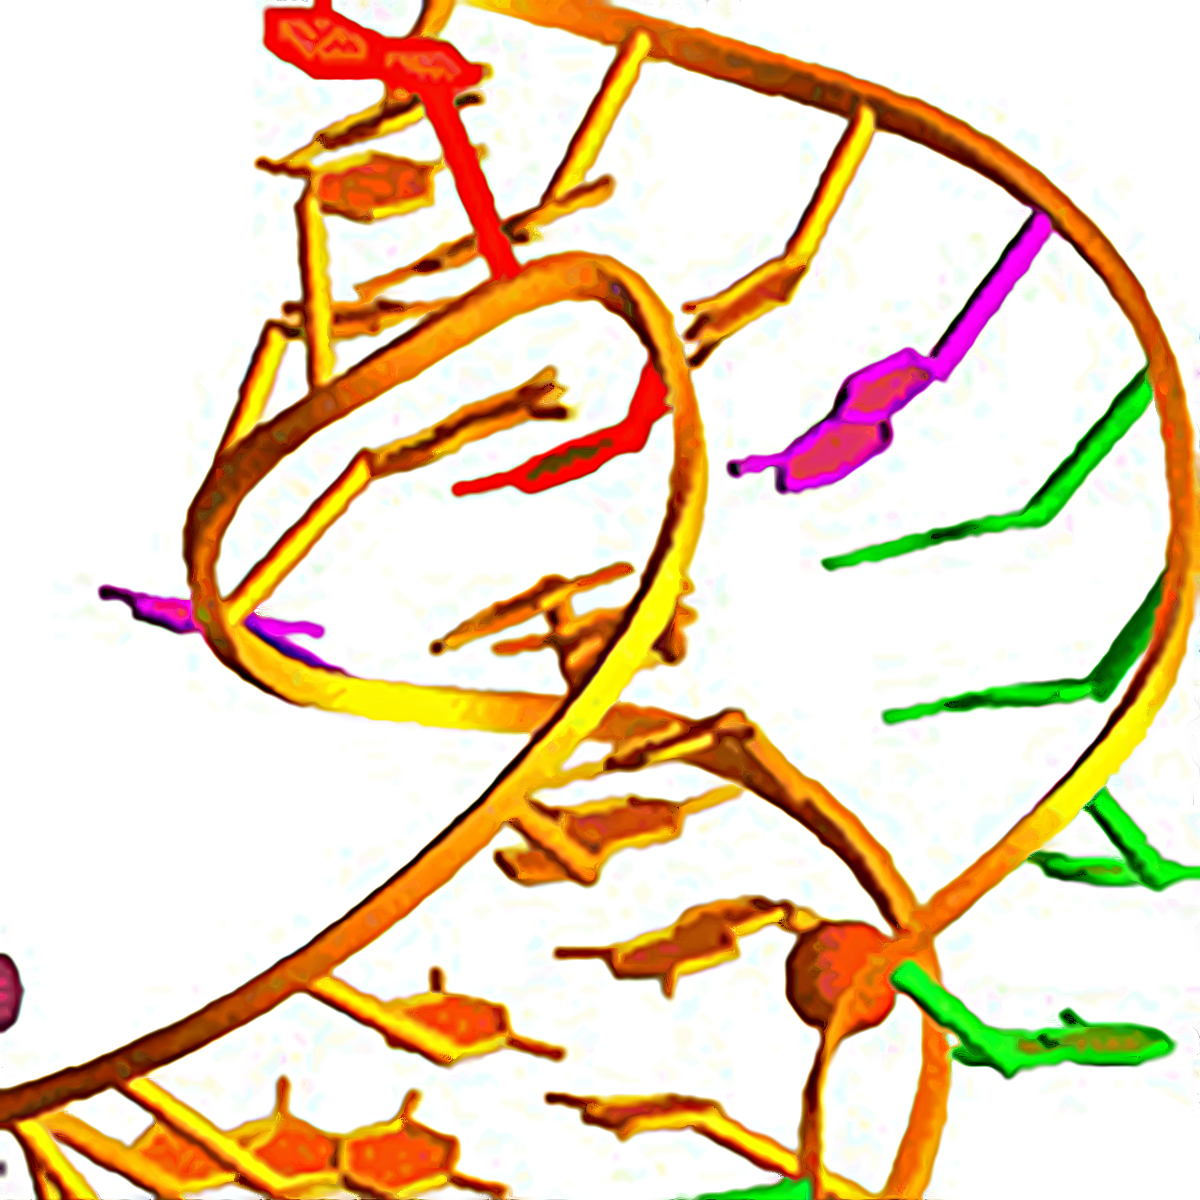 Ribosomal frameshifting in RNA Viruses